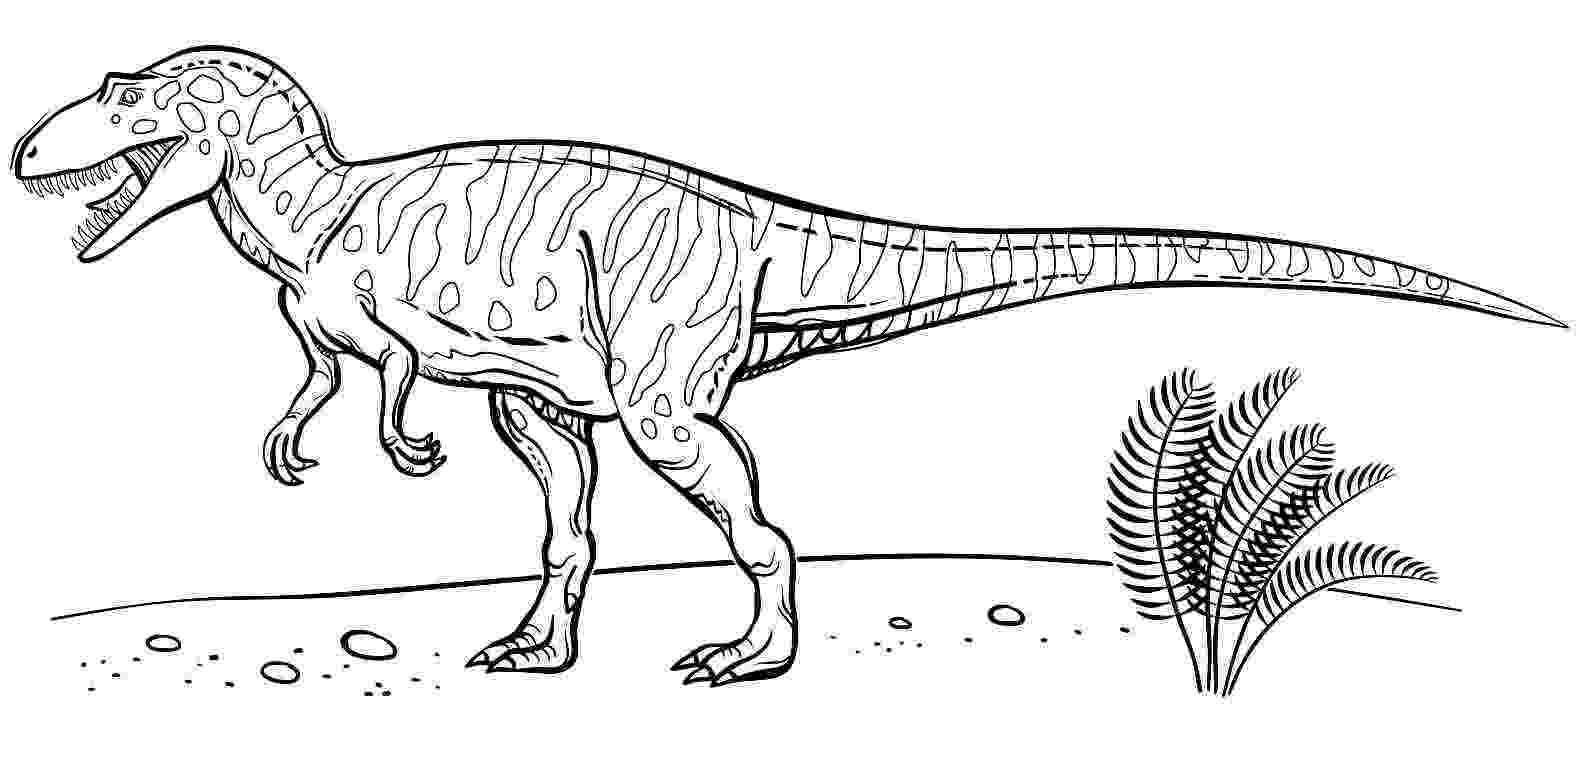 velociraptor coloring page velociraptor coloring pages best coloring pages for kids velociraptor coloring page